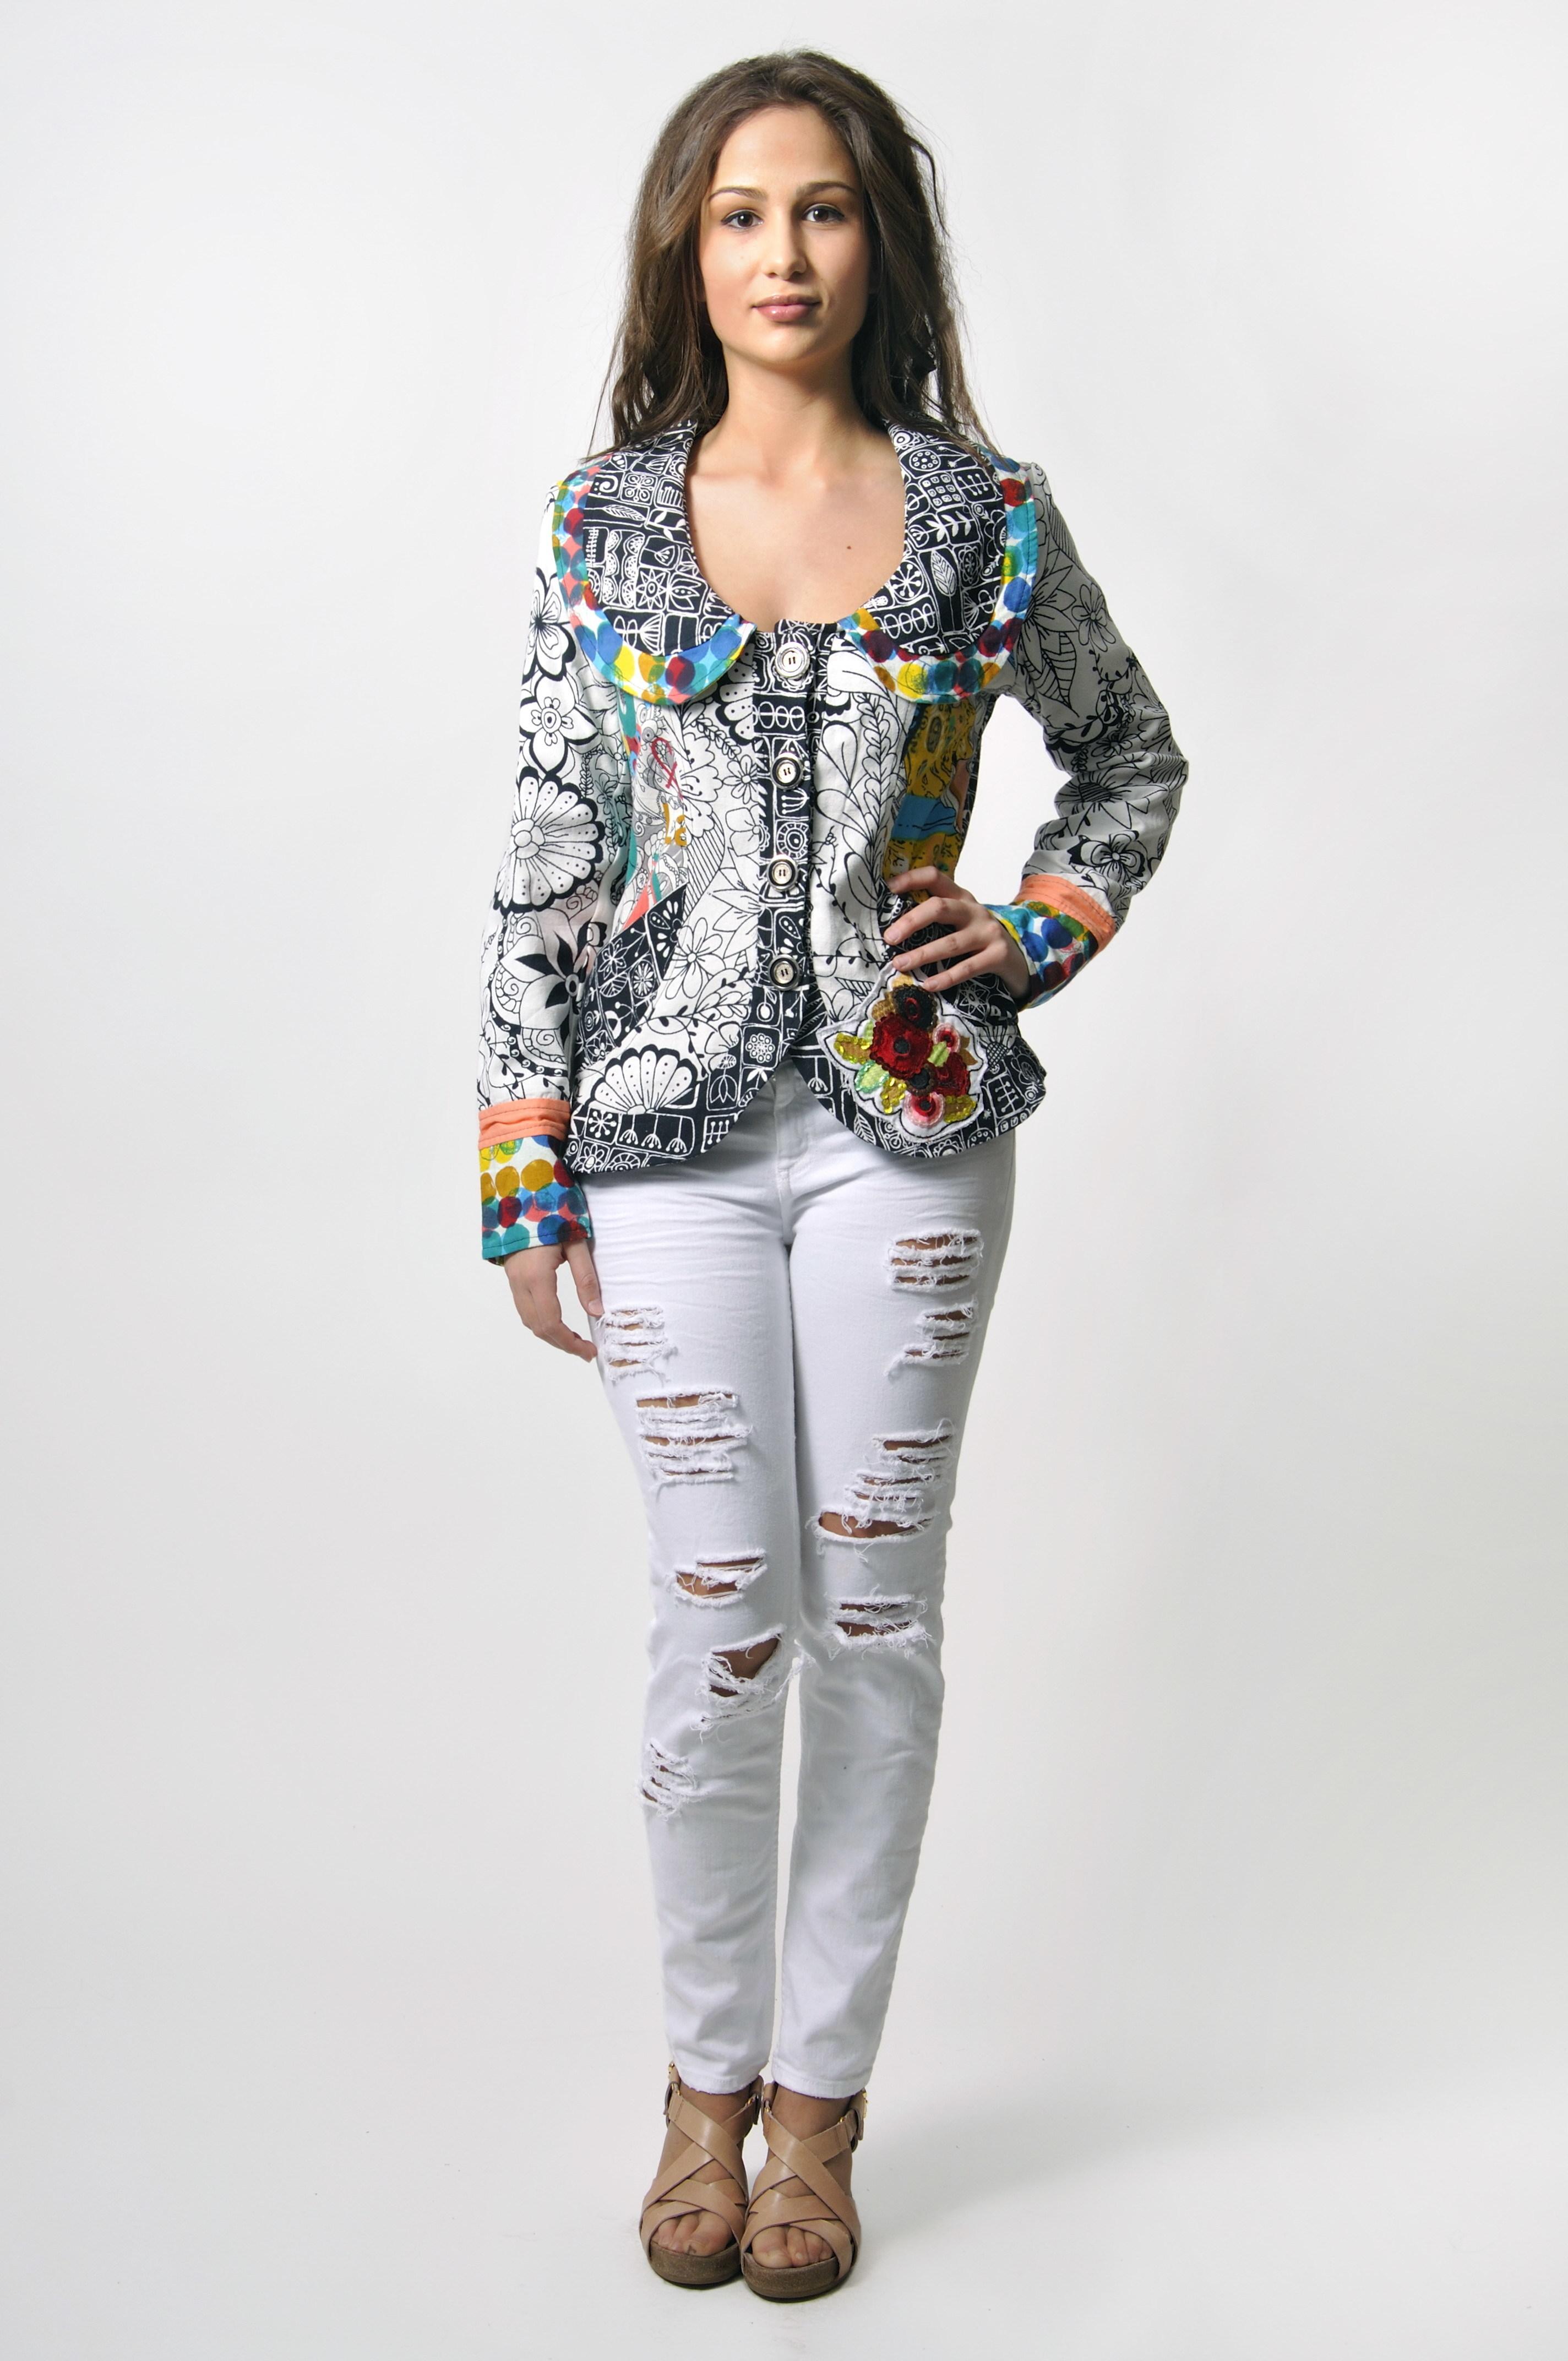 Savage Culture: Kira Shop-a-holic Short Jacket (1 Left!)